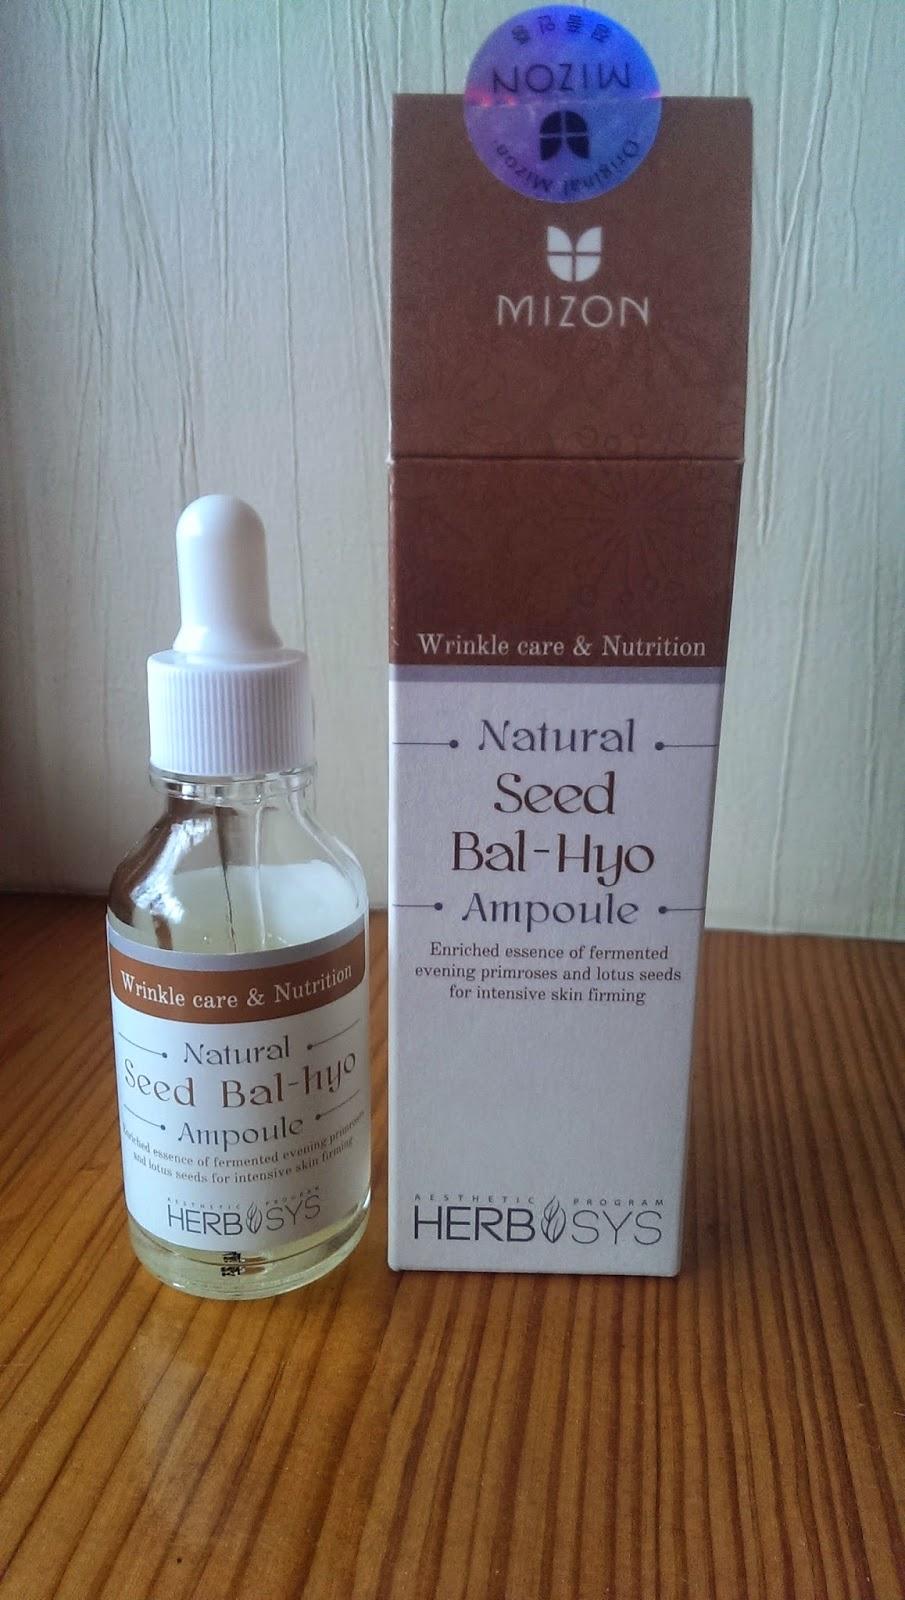 Эссенция Natural Seed Bal-Hyo Ampoule от Mizon